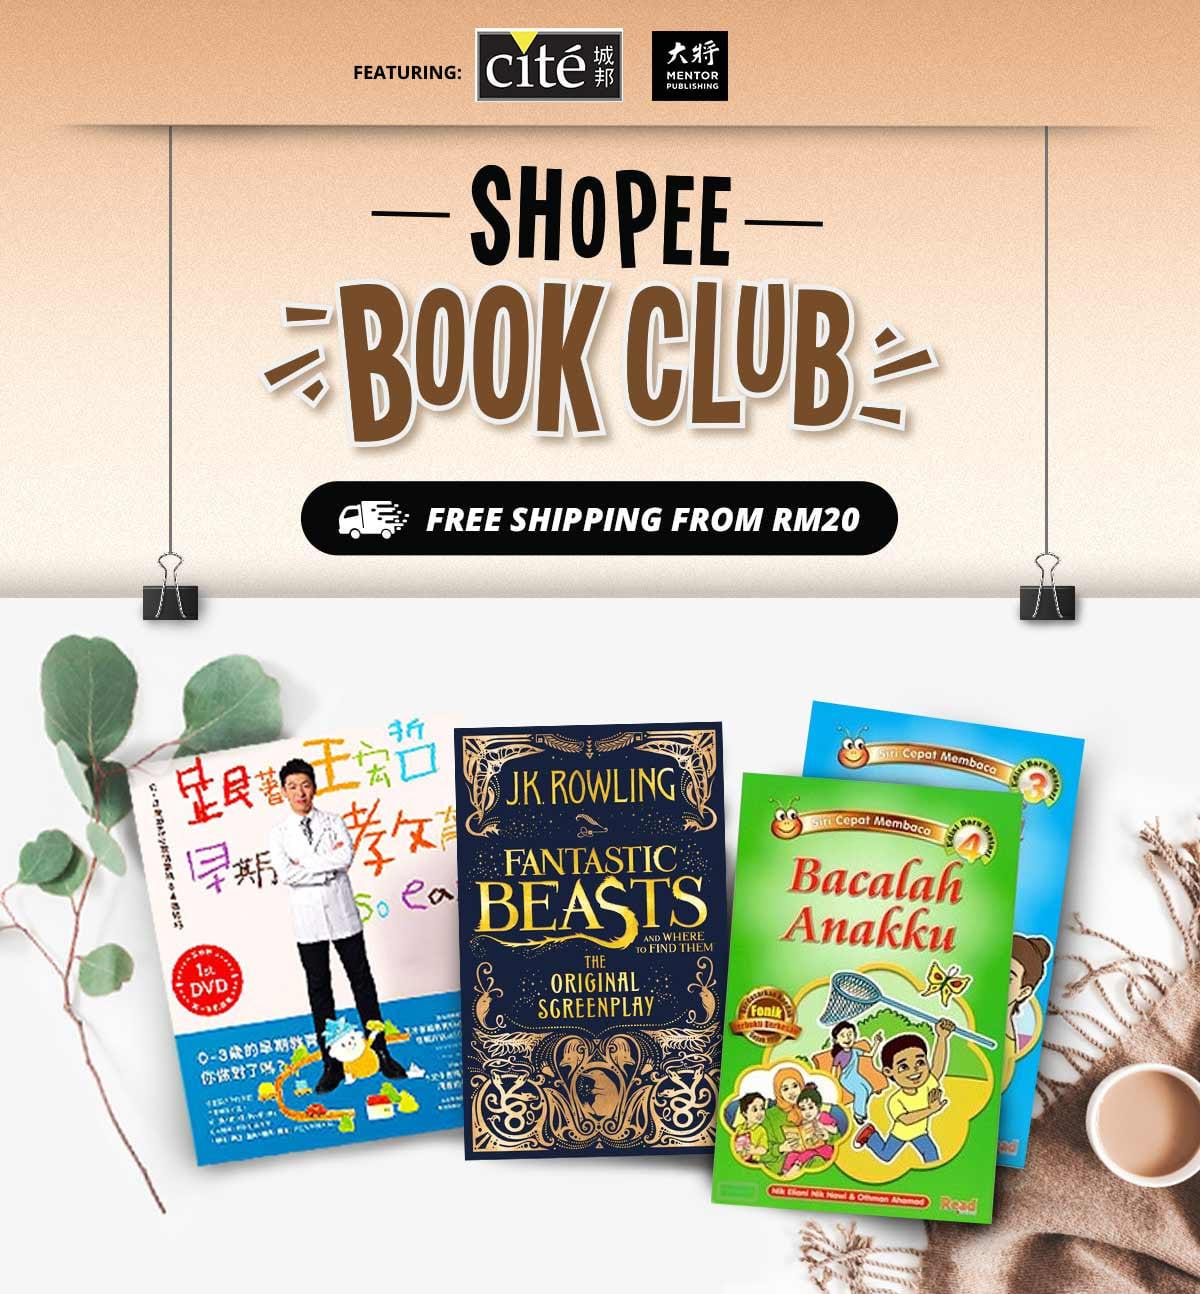 Shopee Book Club 15% OFF